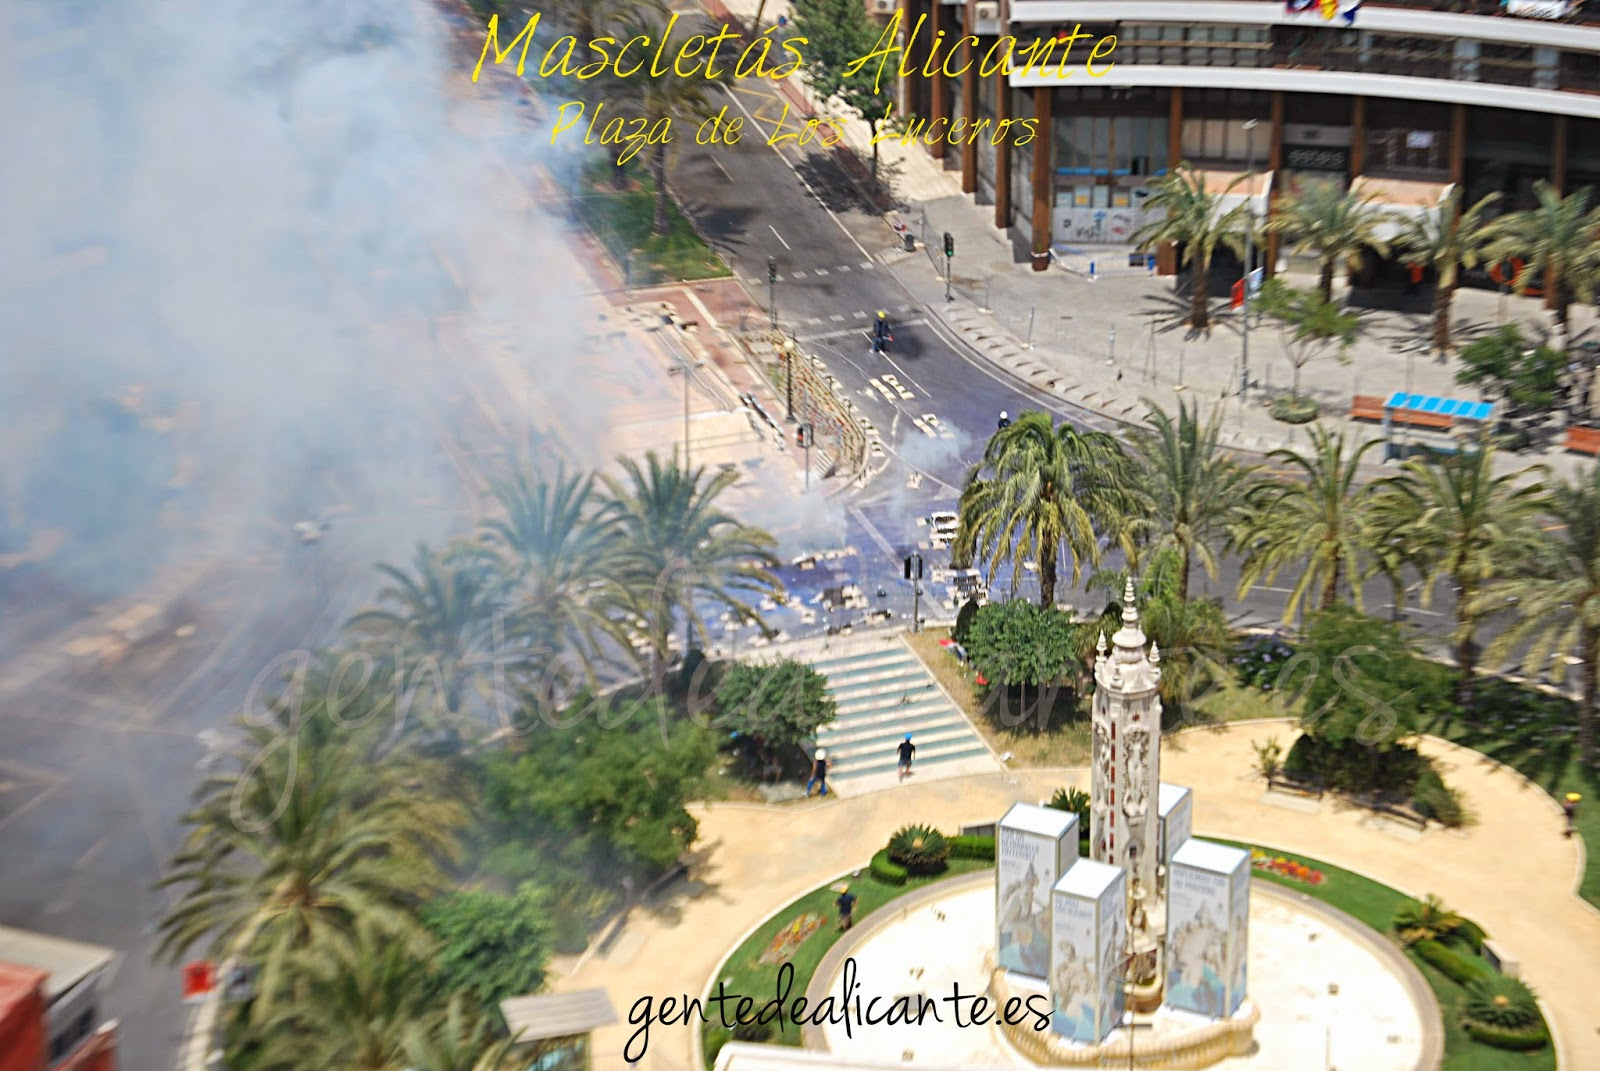 Hogueras-Alicante-Mascletás-Foto